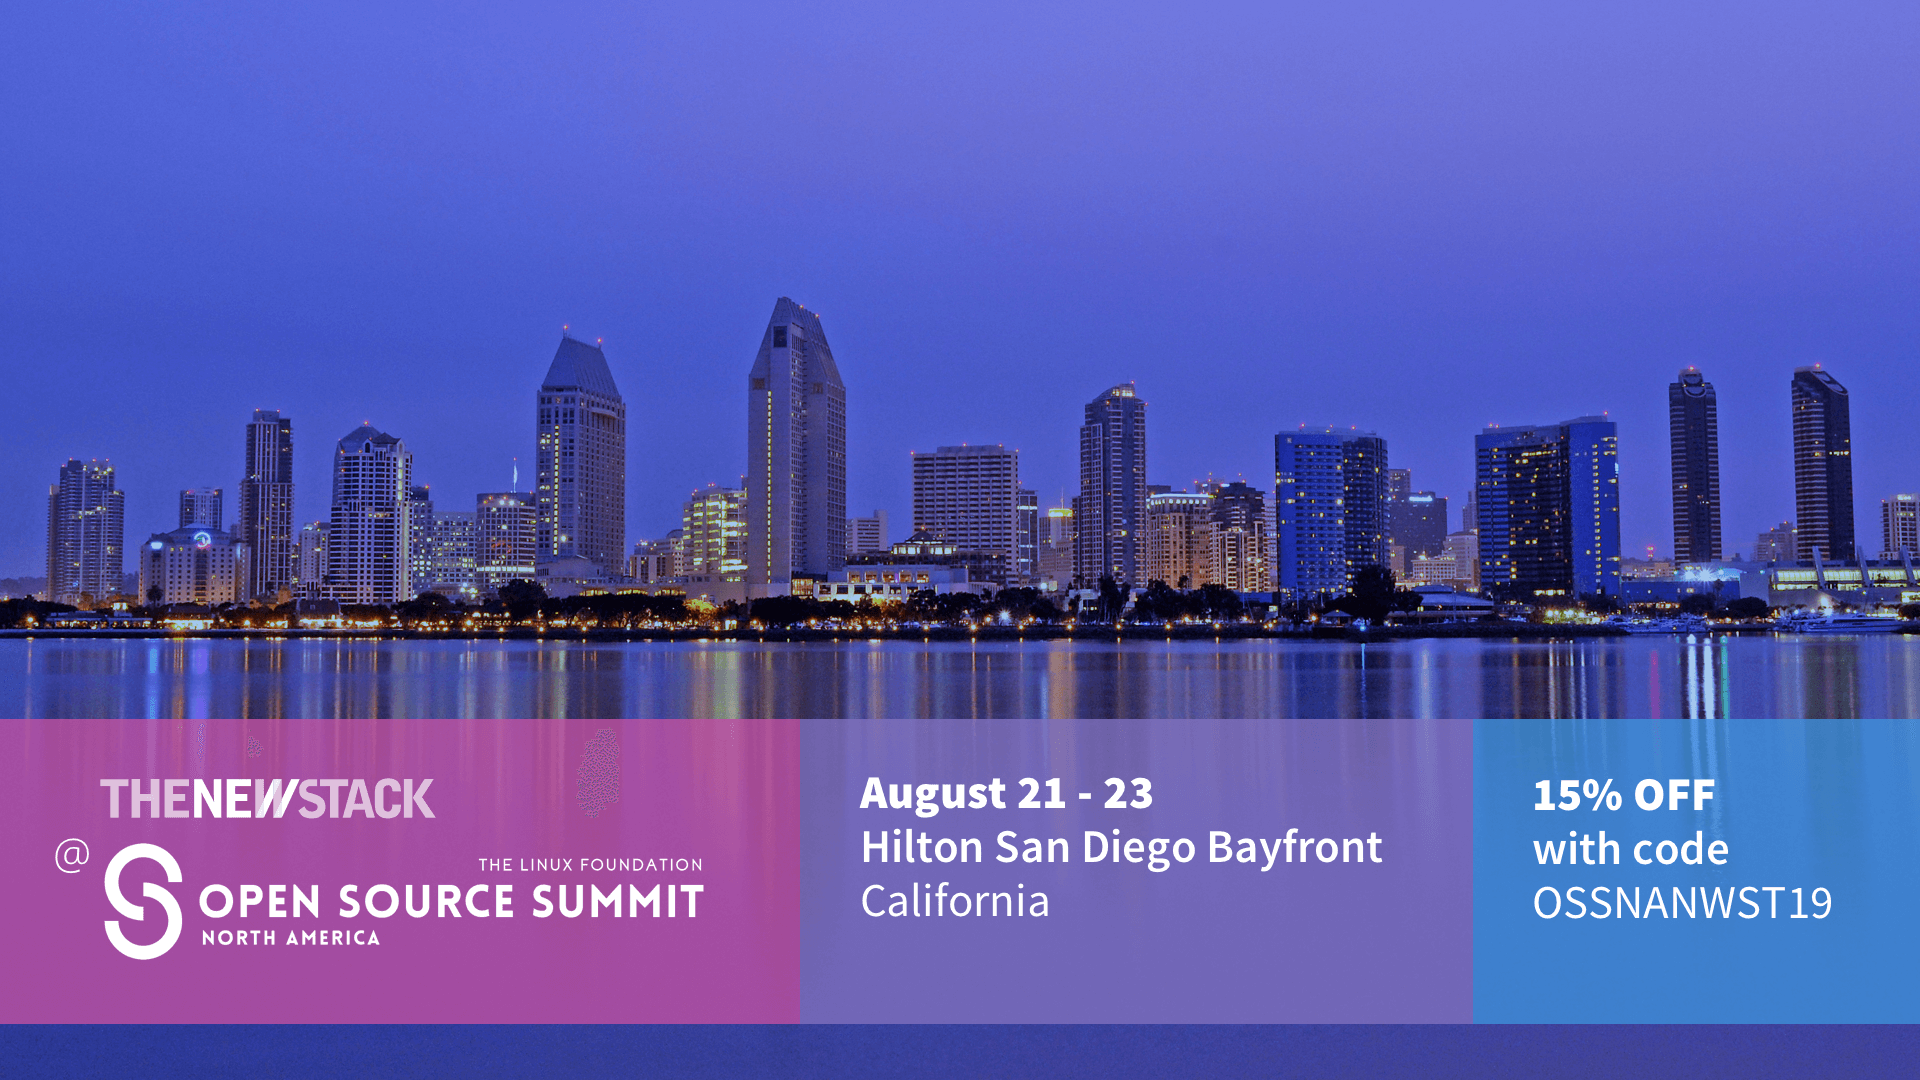 Open Source Summit NA in San Diego / August 21 - 23, 2019